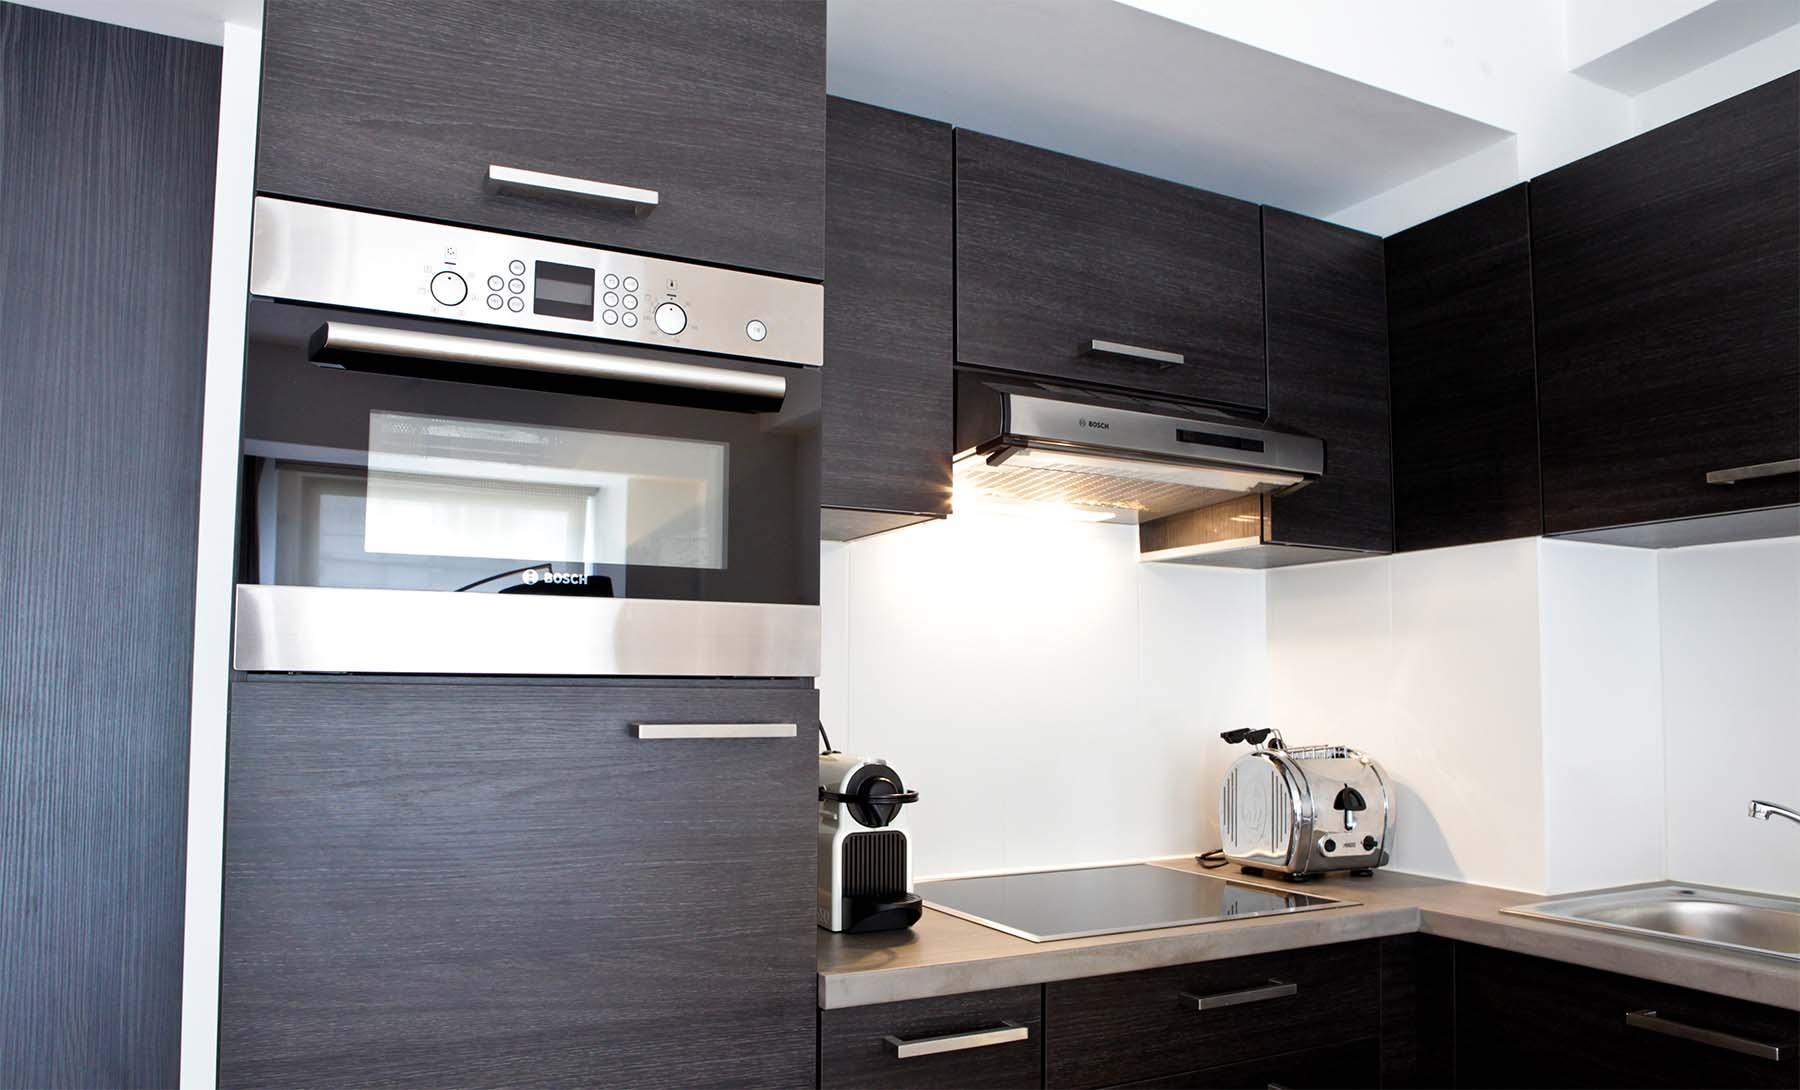 Appartment_0005_flat-brugmann-kitchen.jpg